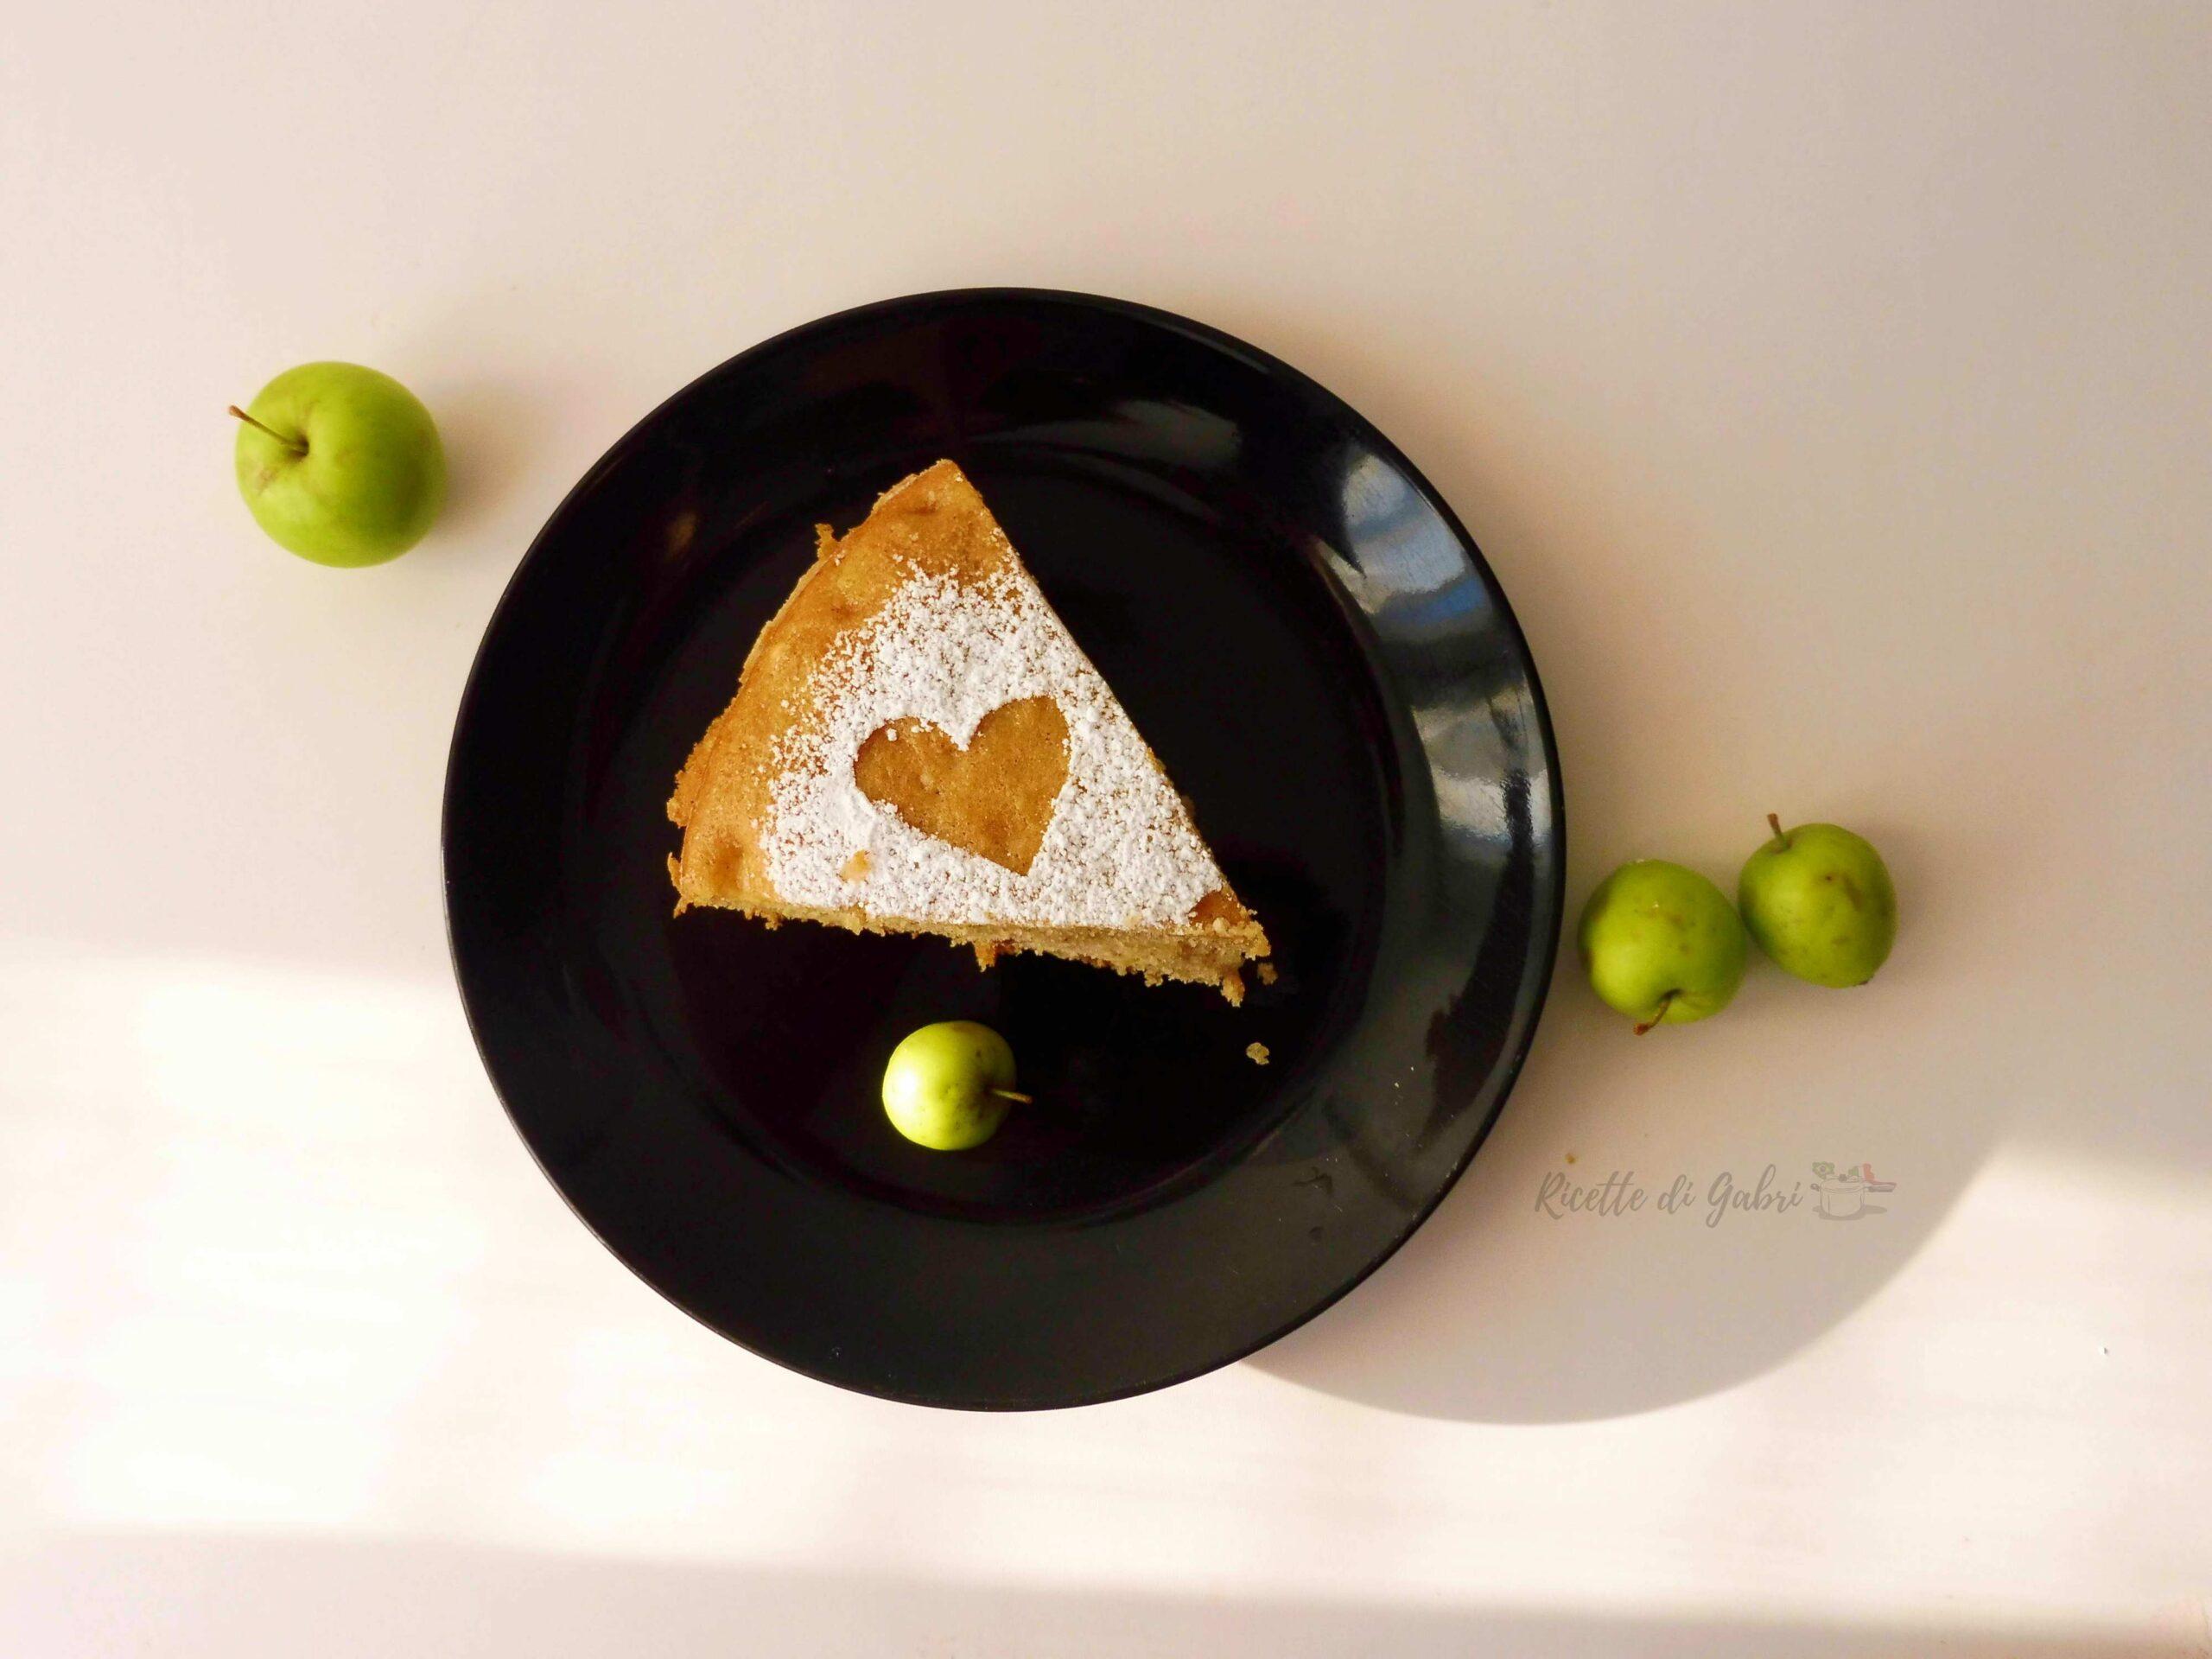 torta di mele semplice senza burro veloce facile mele selvatiche gabri